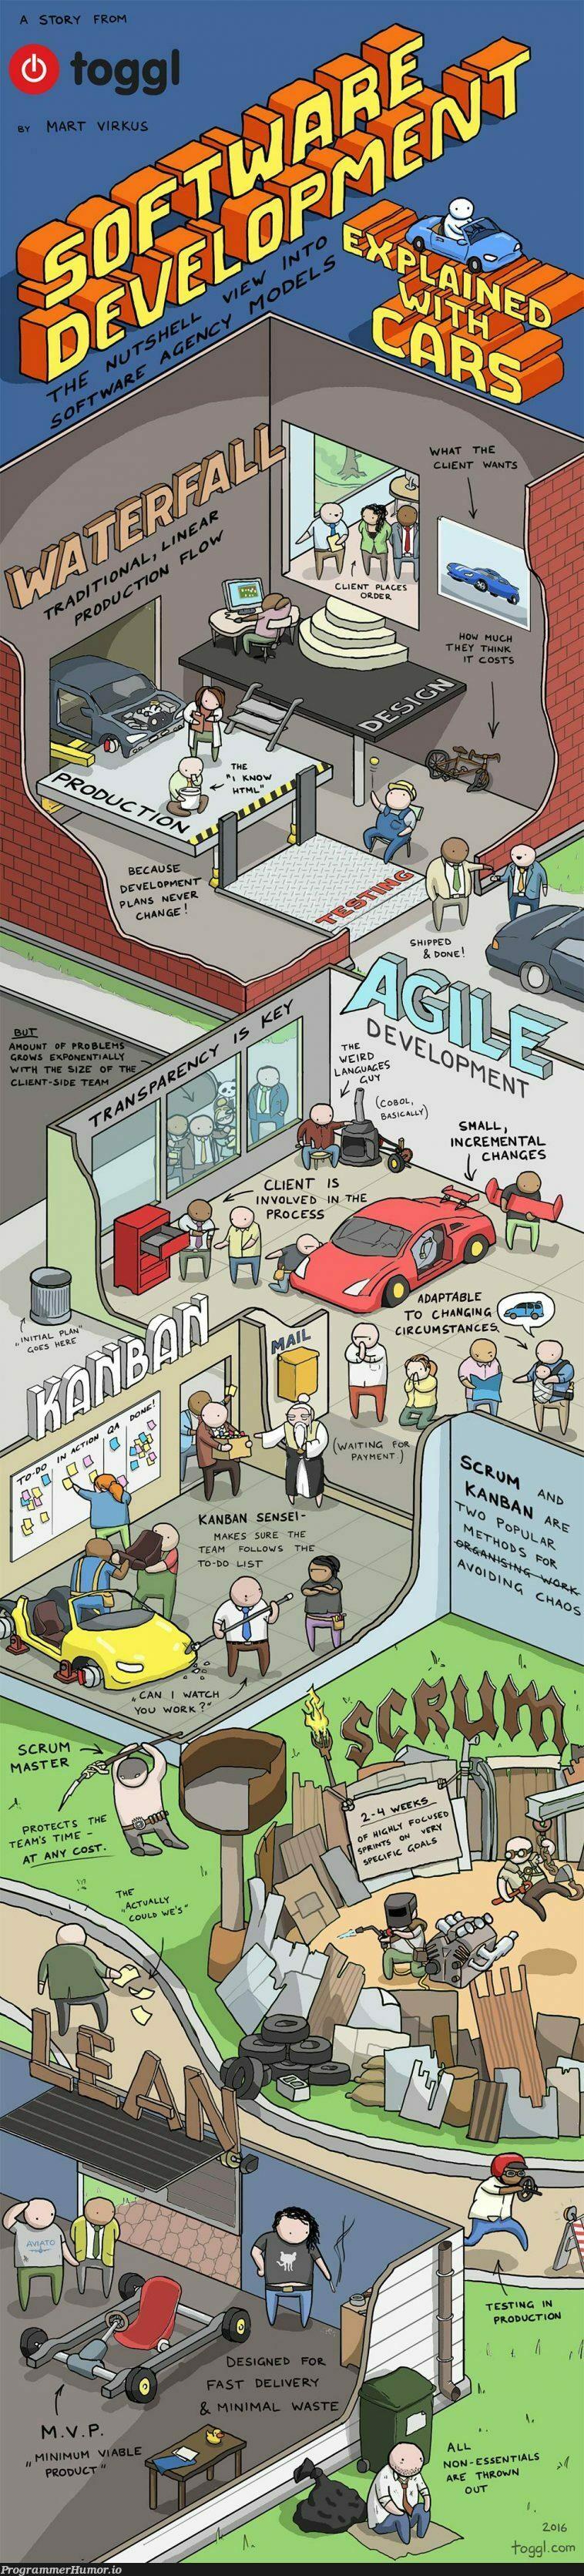 Software development explained with cars | software-memes, development-memes, testing-memes, test-memes, list-memes, url-memes, cli-memes, production-memes, IT-memes, product-memes | ProgrammerHumor.io